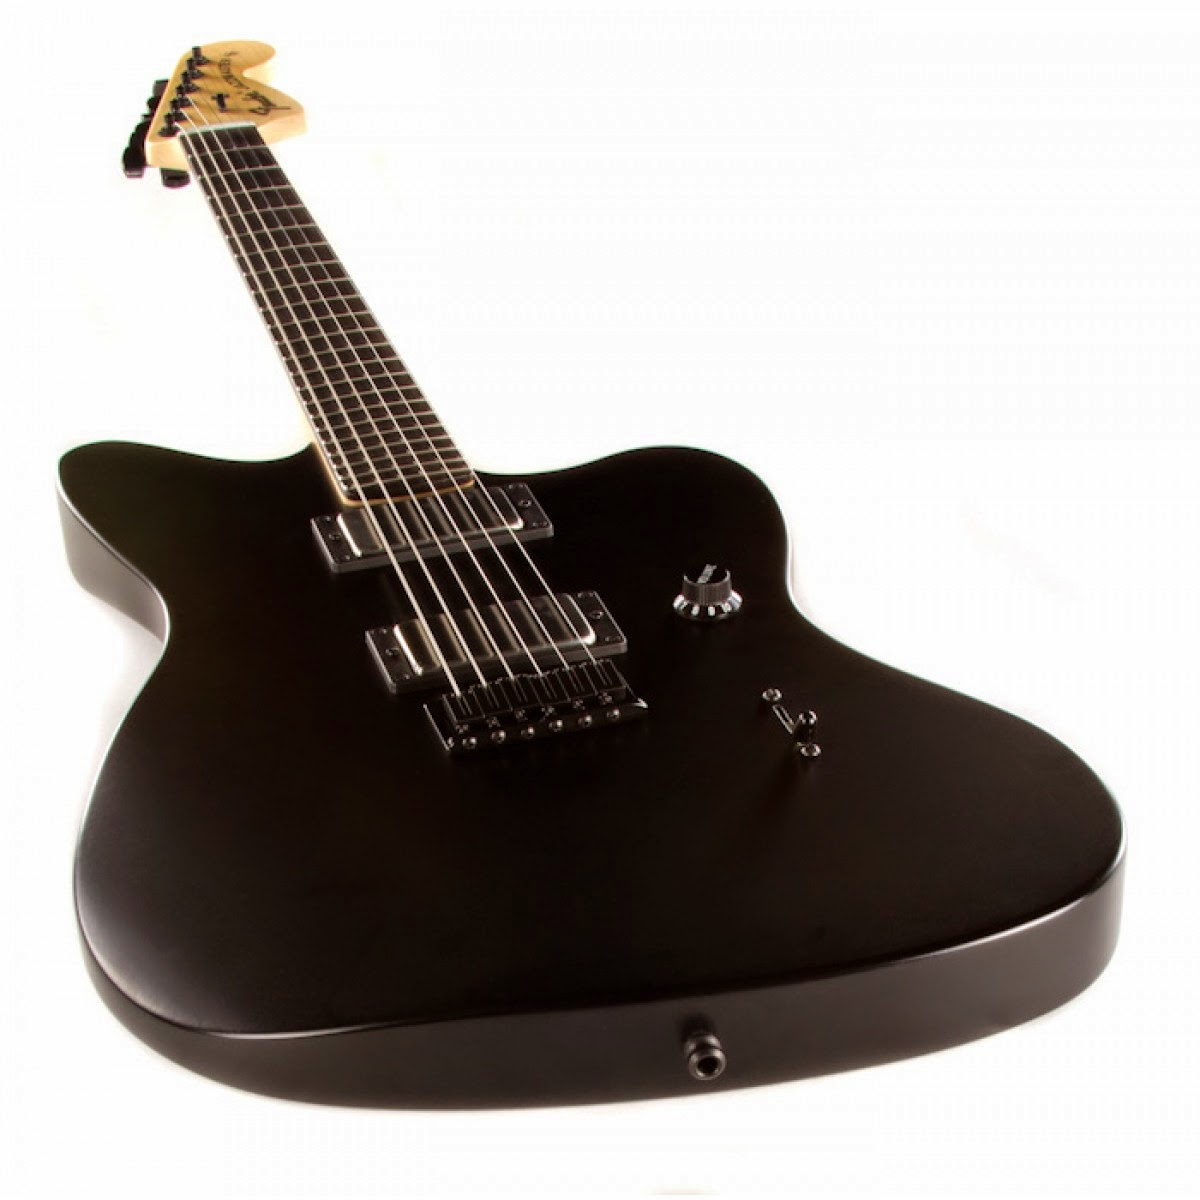 The Adhd Guitarist November 2014